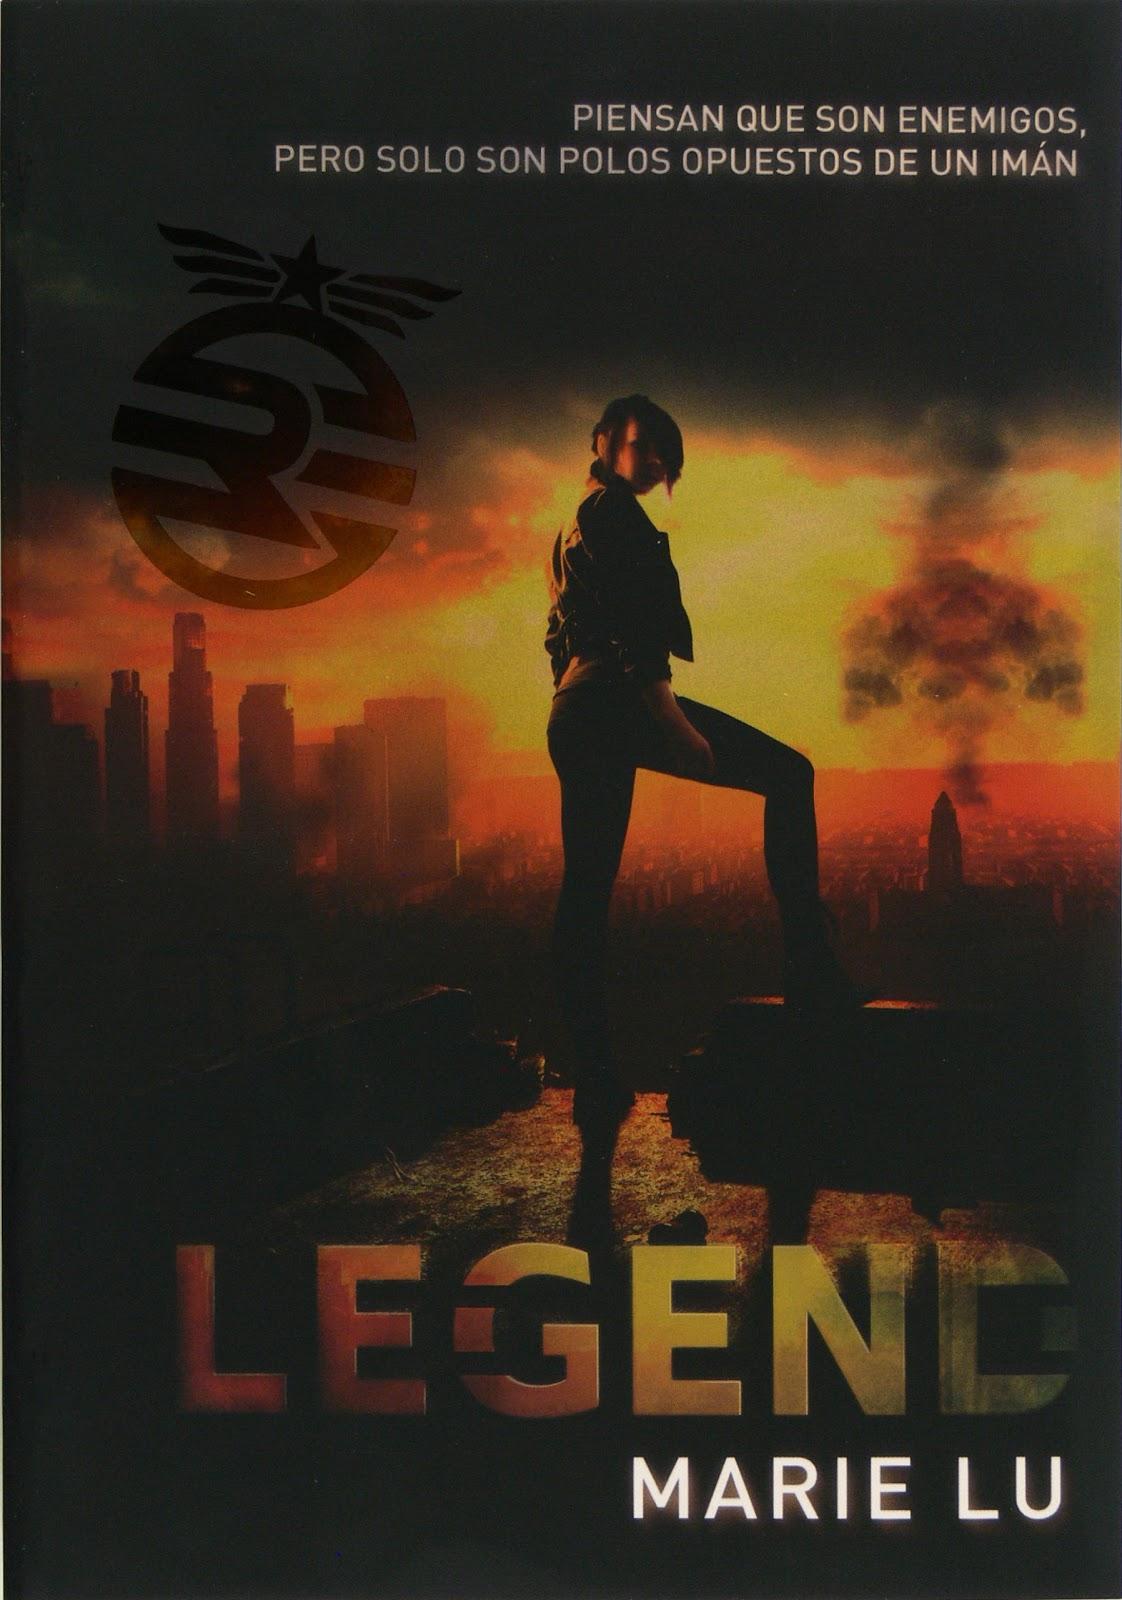 http://nacidosparaleerig.blogspot.com.es/2015/11/resena-legend-marie-lu.html